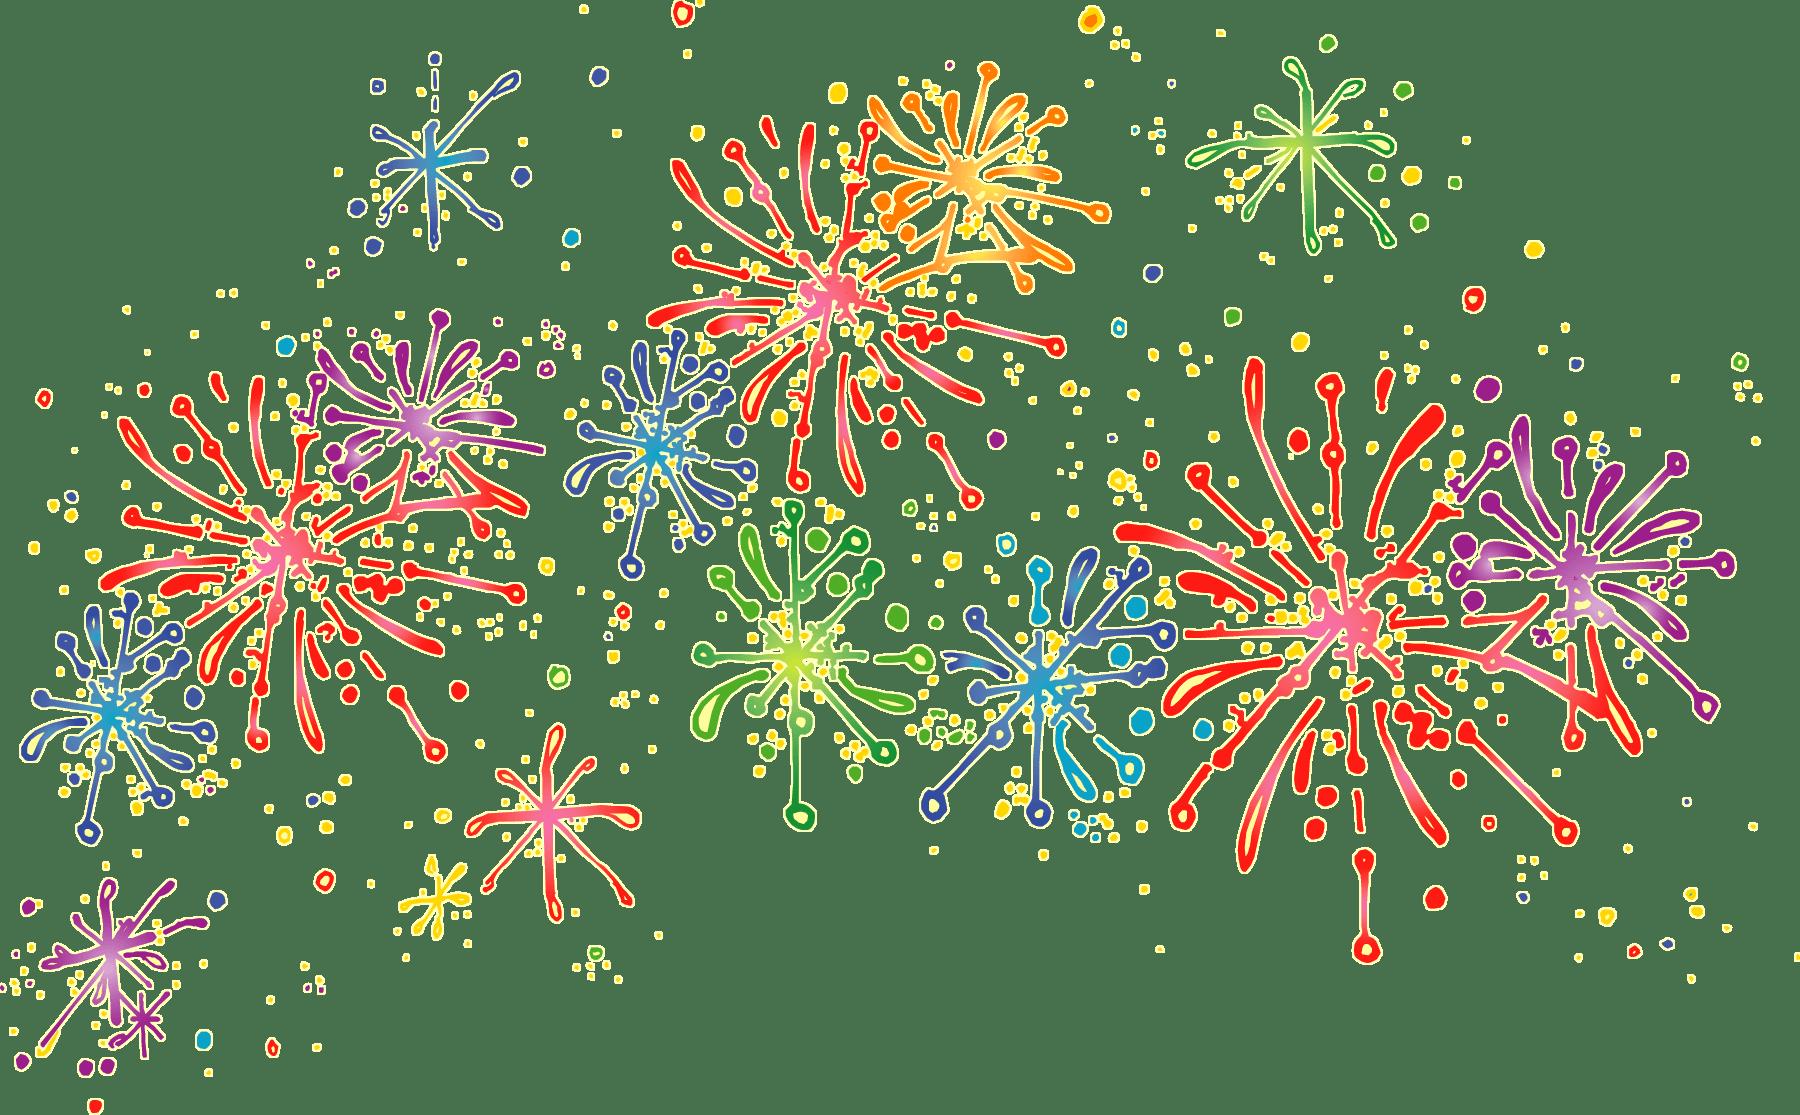 Cartoon Fireworks Transparent Png Stickpng